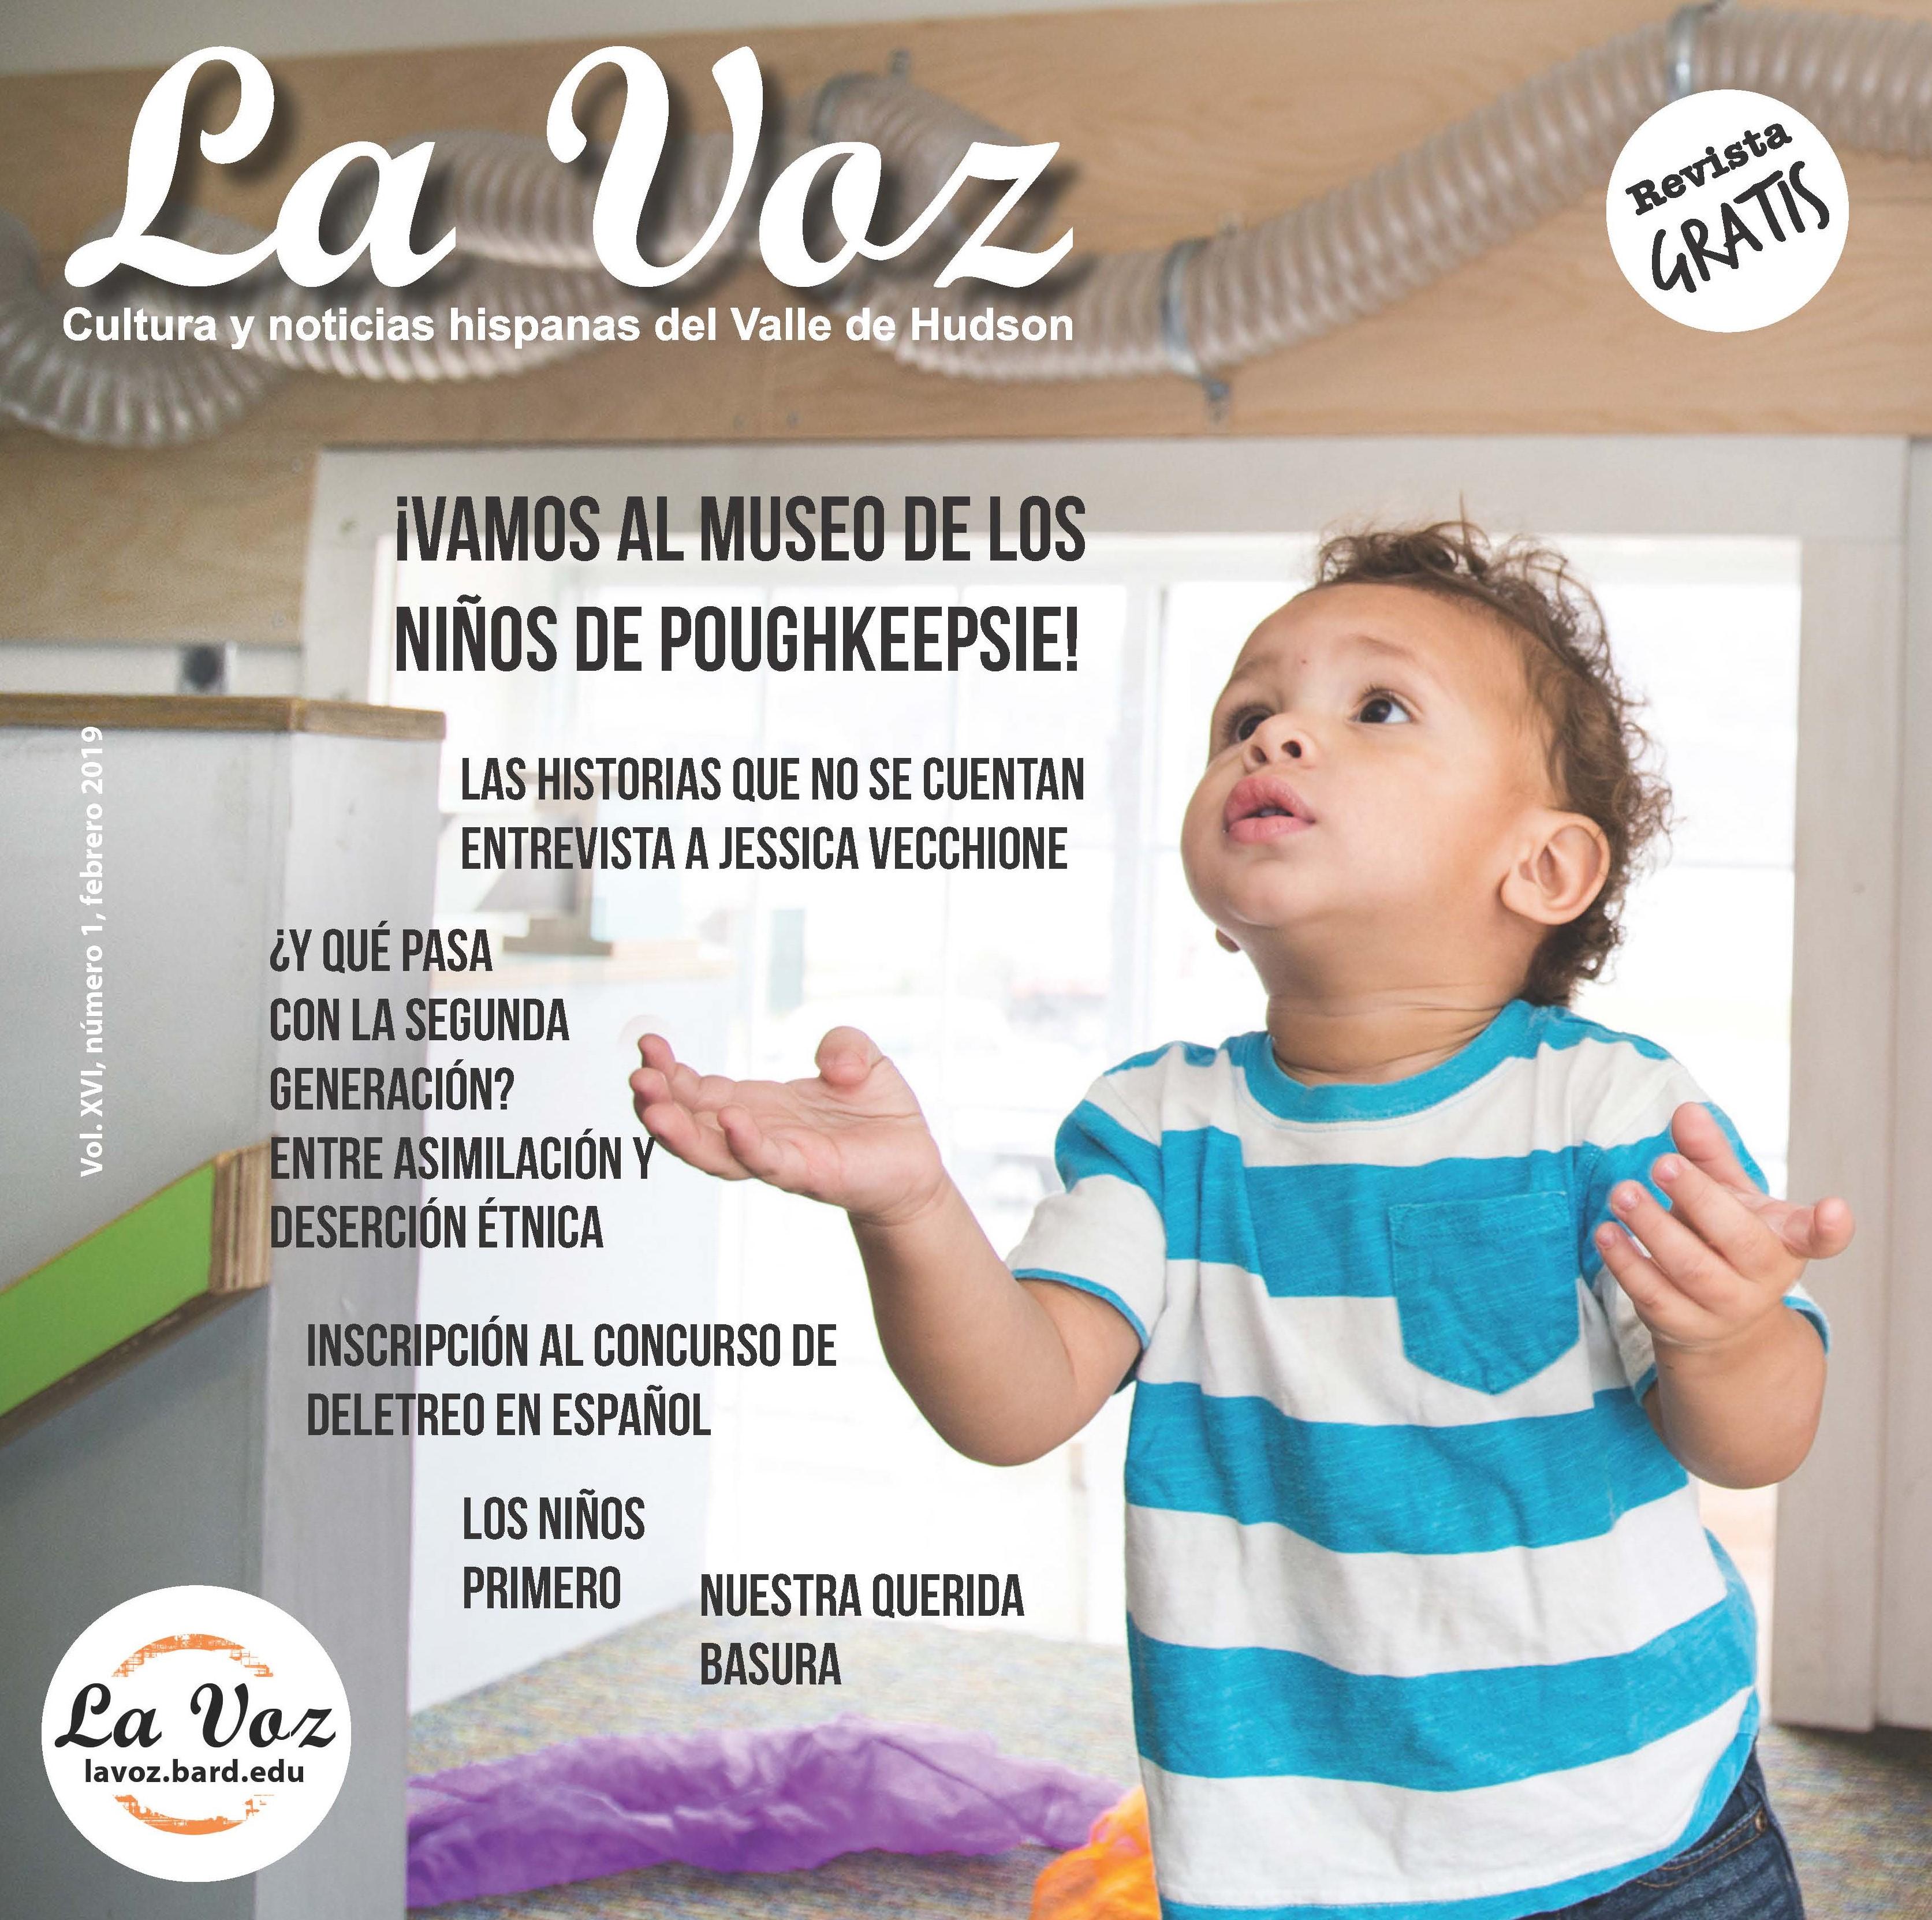 Imagen de la portada de La Voz, febrero 2019, foto créditoHudson Valley Children's Museum